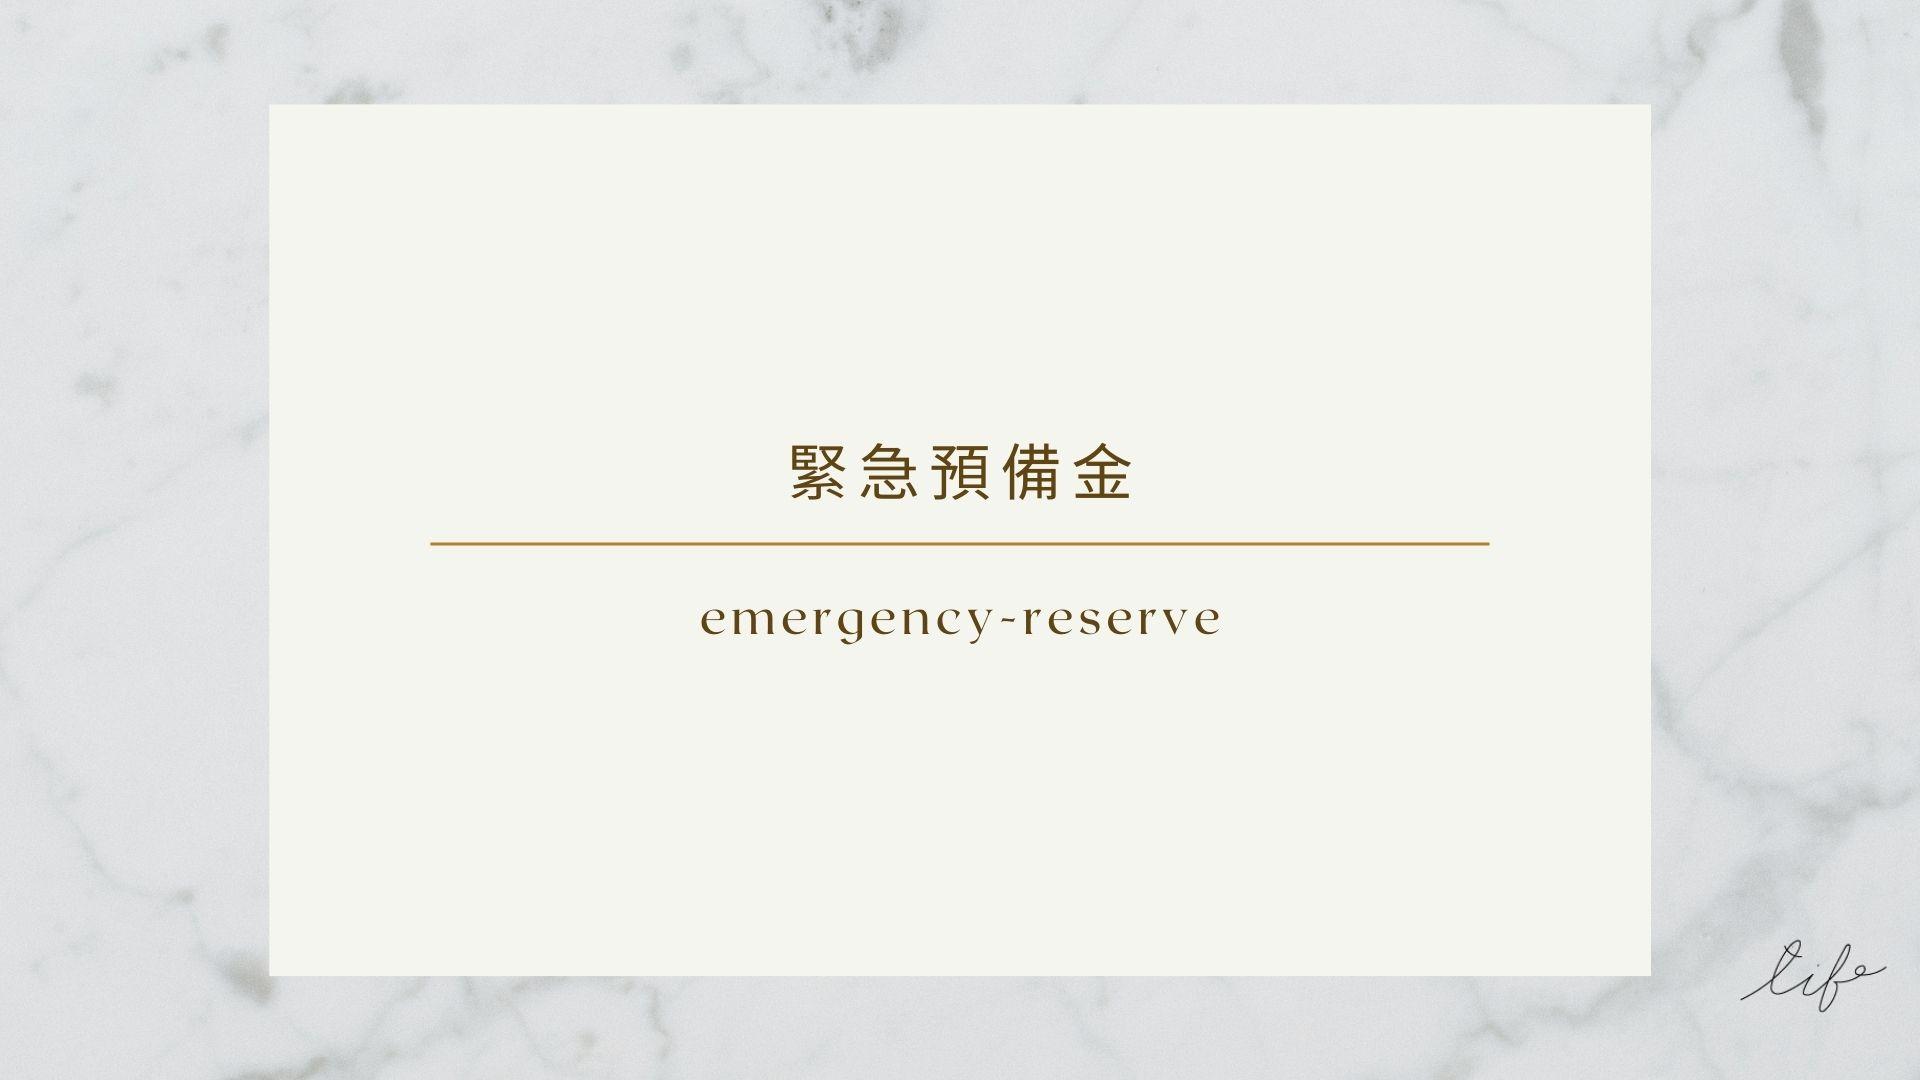 emergency-reserve緊急預備金